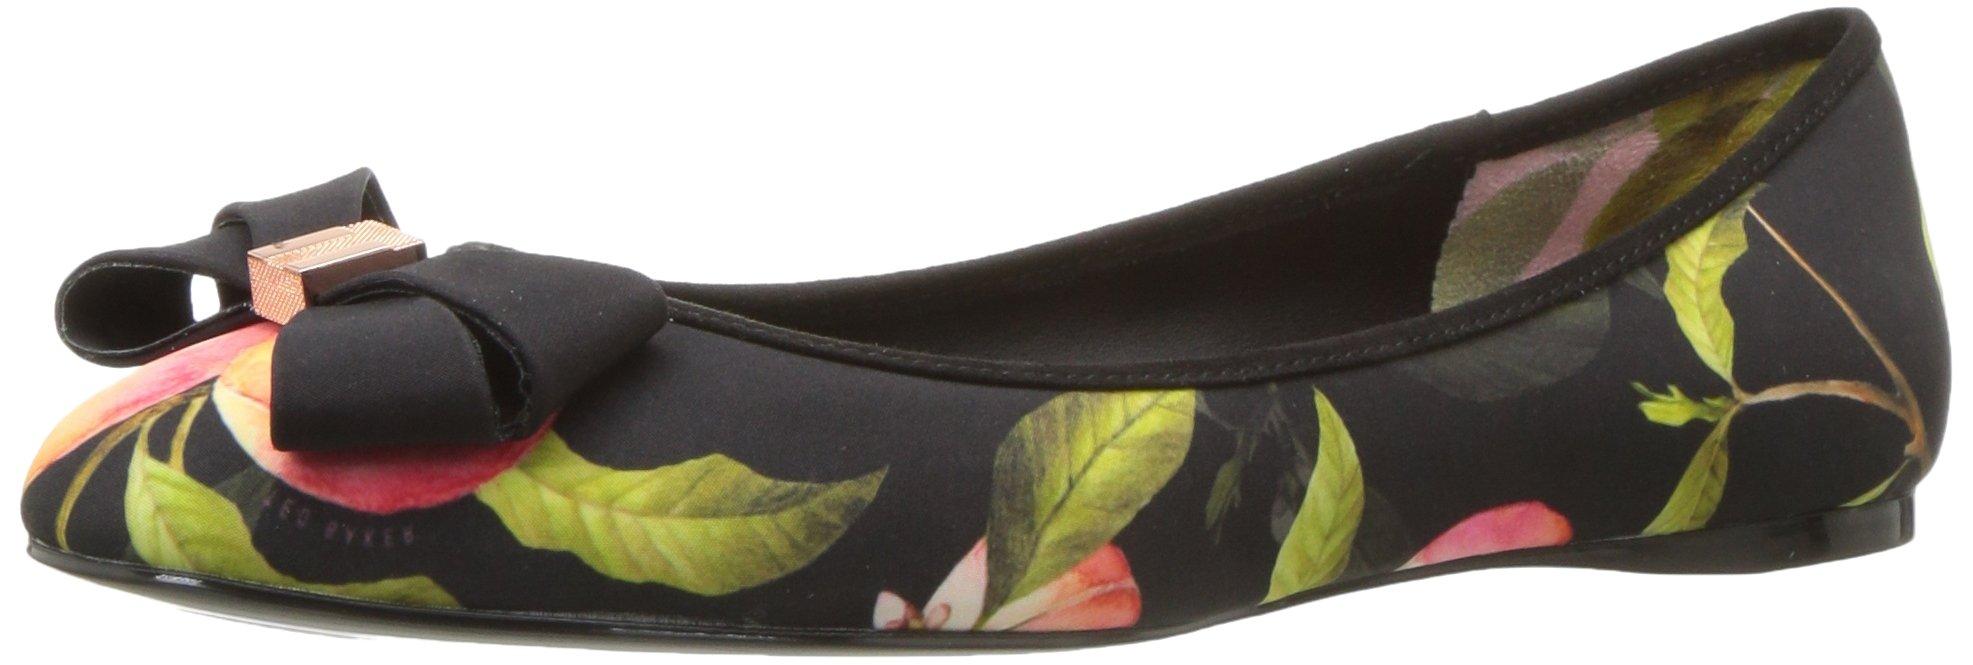 Ted Baker Women's Immet Ballet Shoe, Peach Blossom Black Textile, 9.5 M US